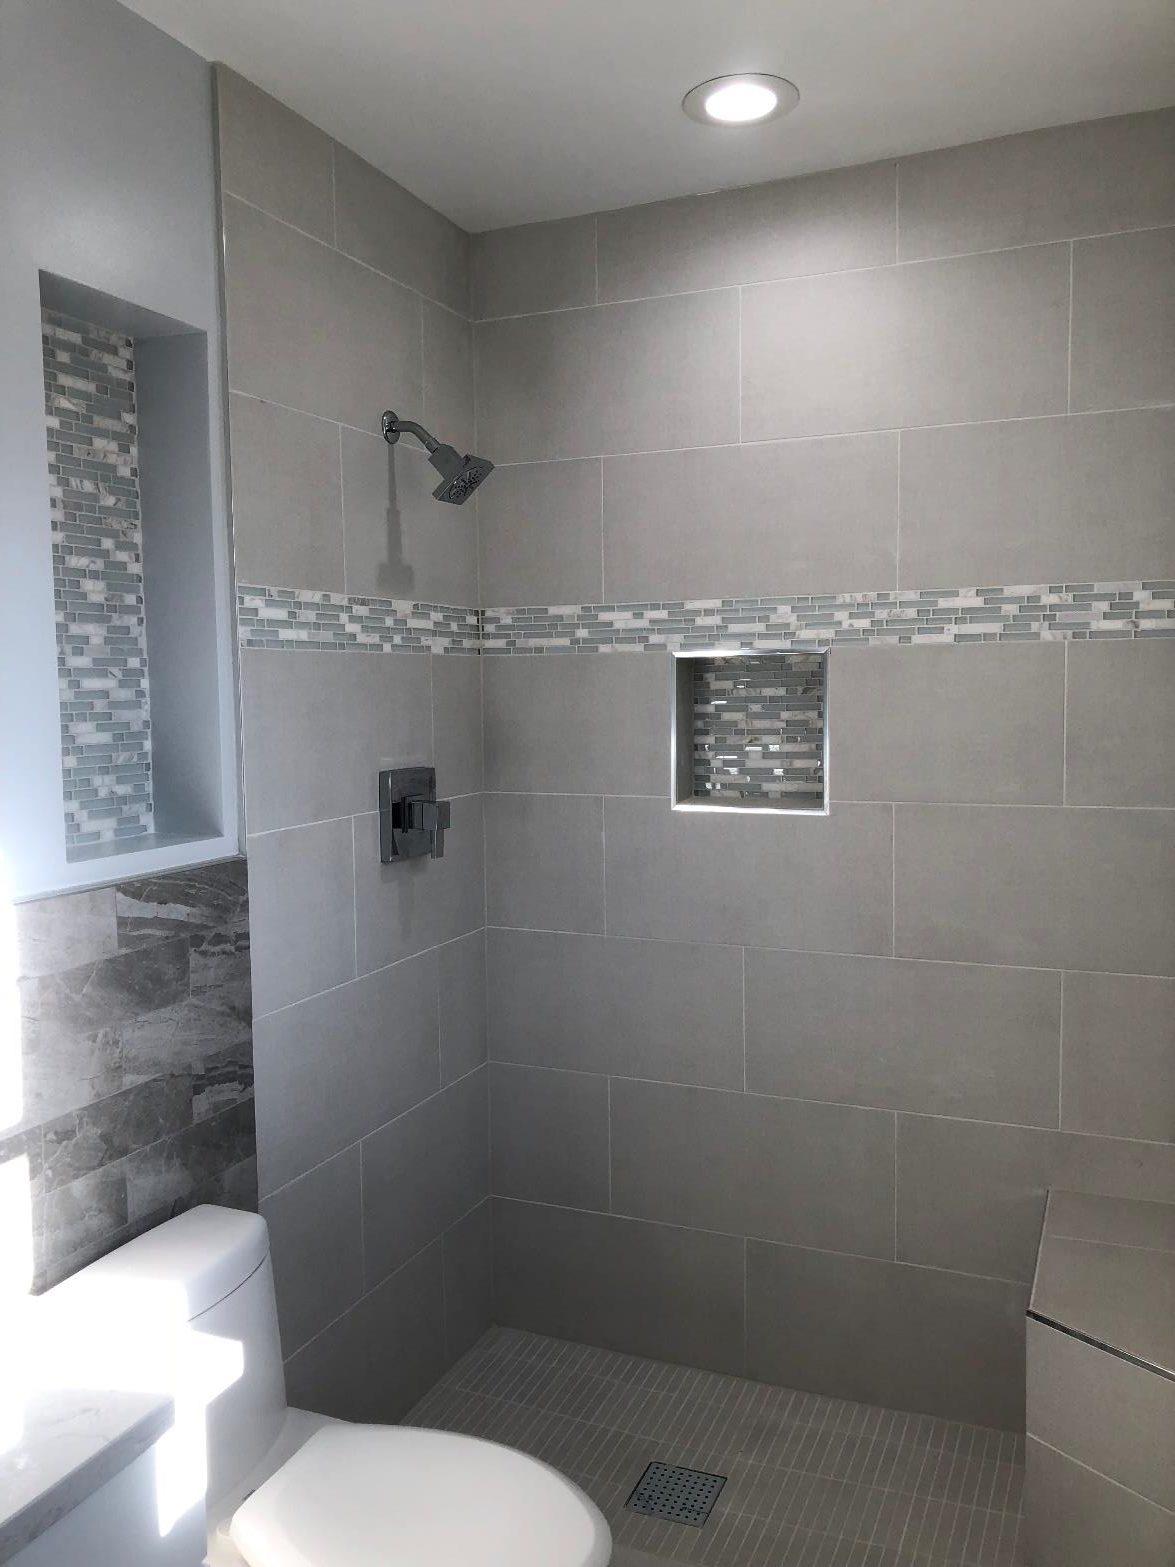 Master bathroom shower room and toilet setup